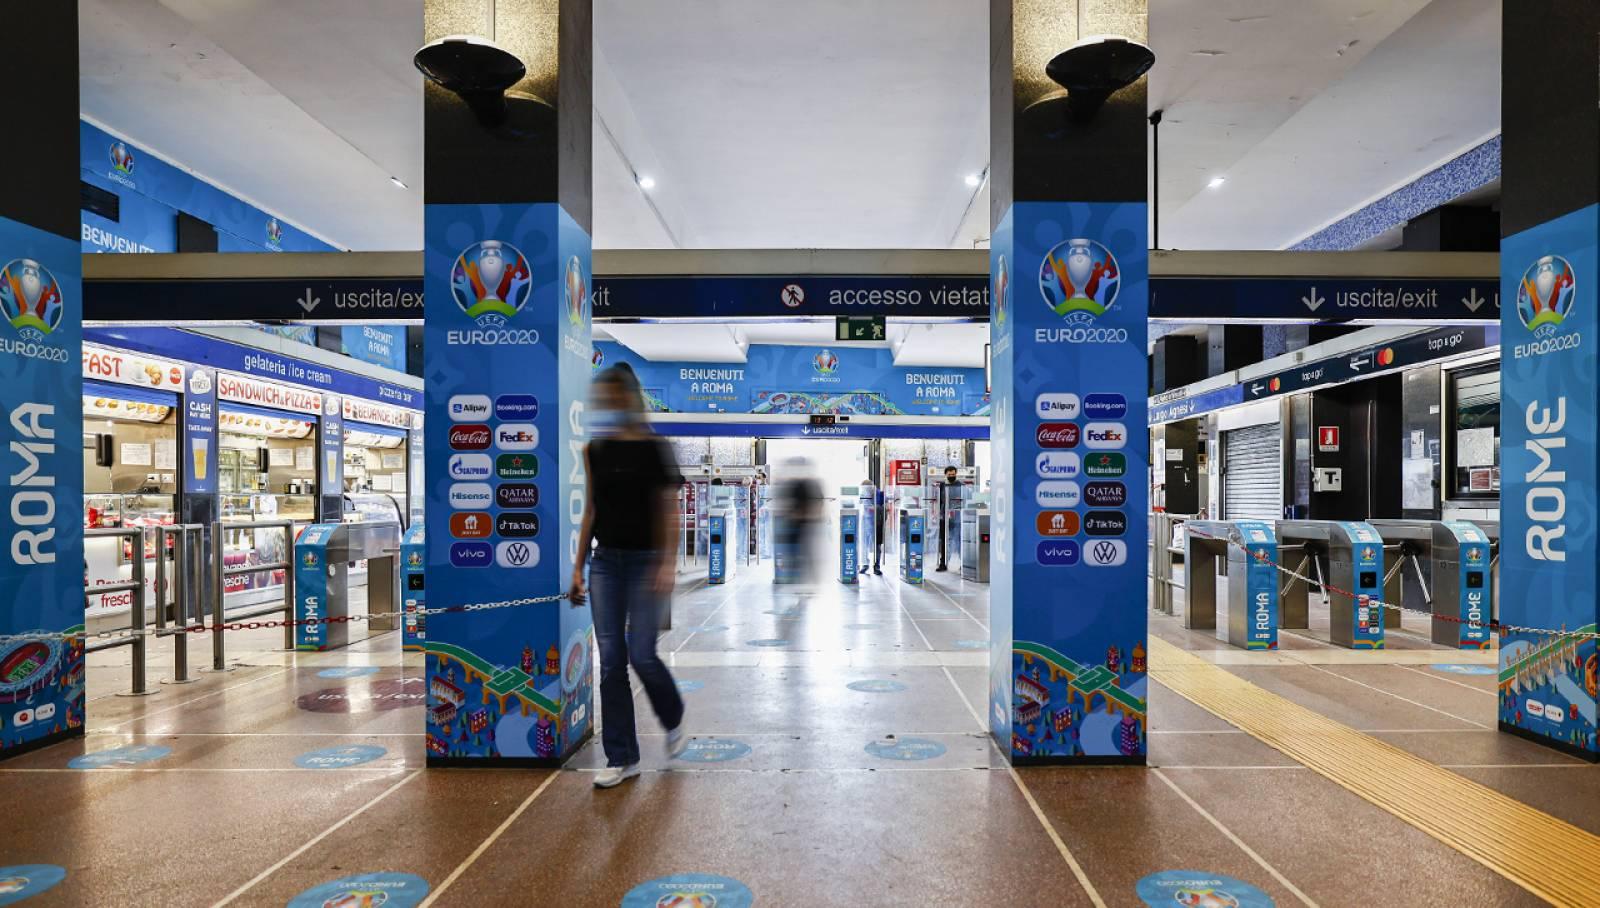 Pubblicità metropolitana a Roma IGPDecaux Station Domination per UEFA 2020